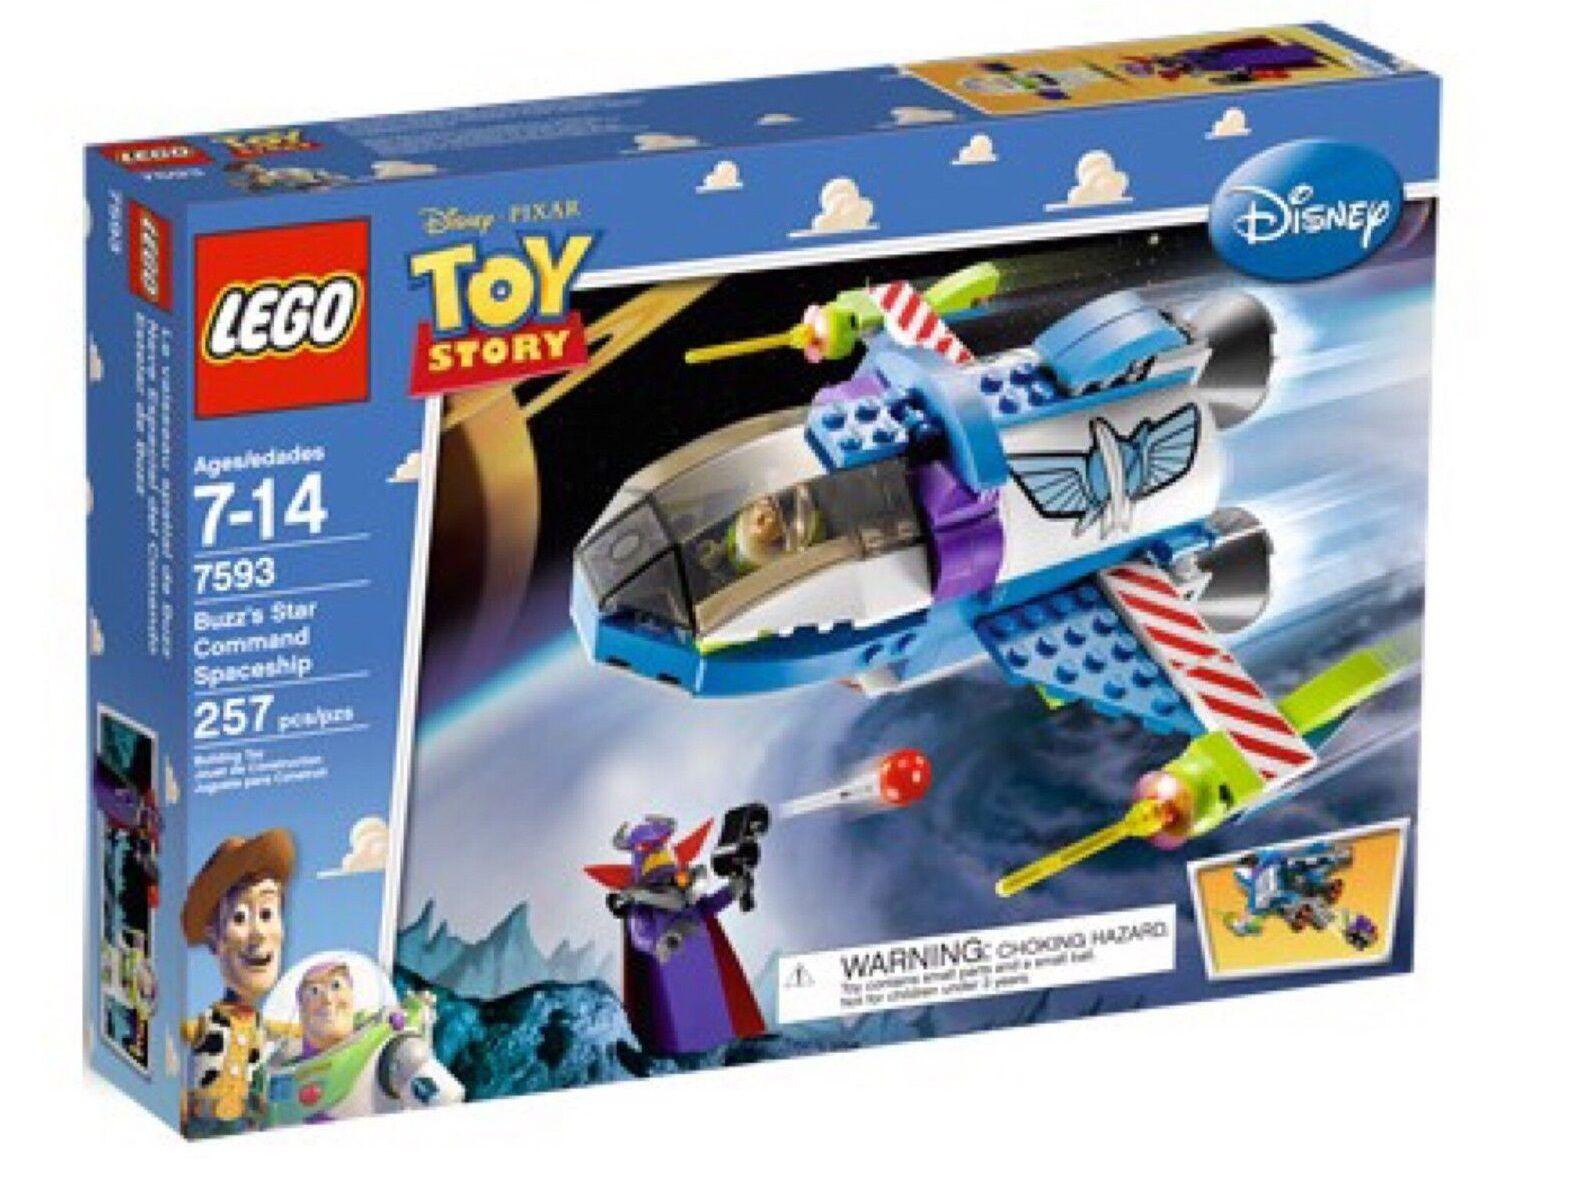 Lego 7593 Toy Story-Buzz 's Star Command Spaceship-DGSIM NEUF non ouvert